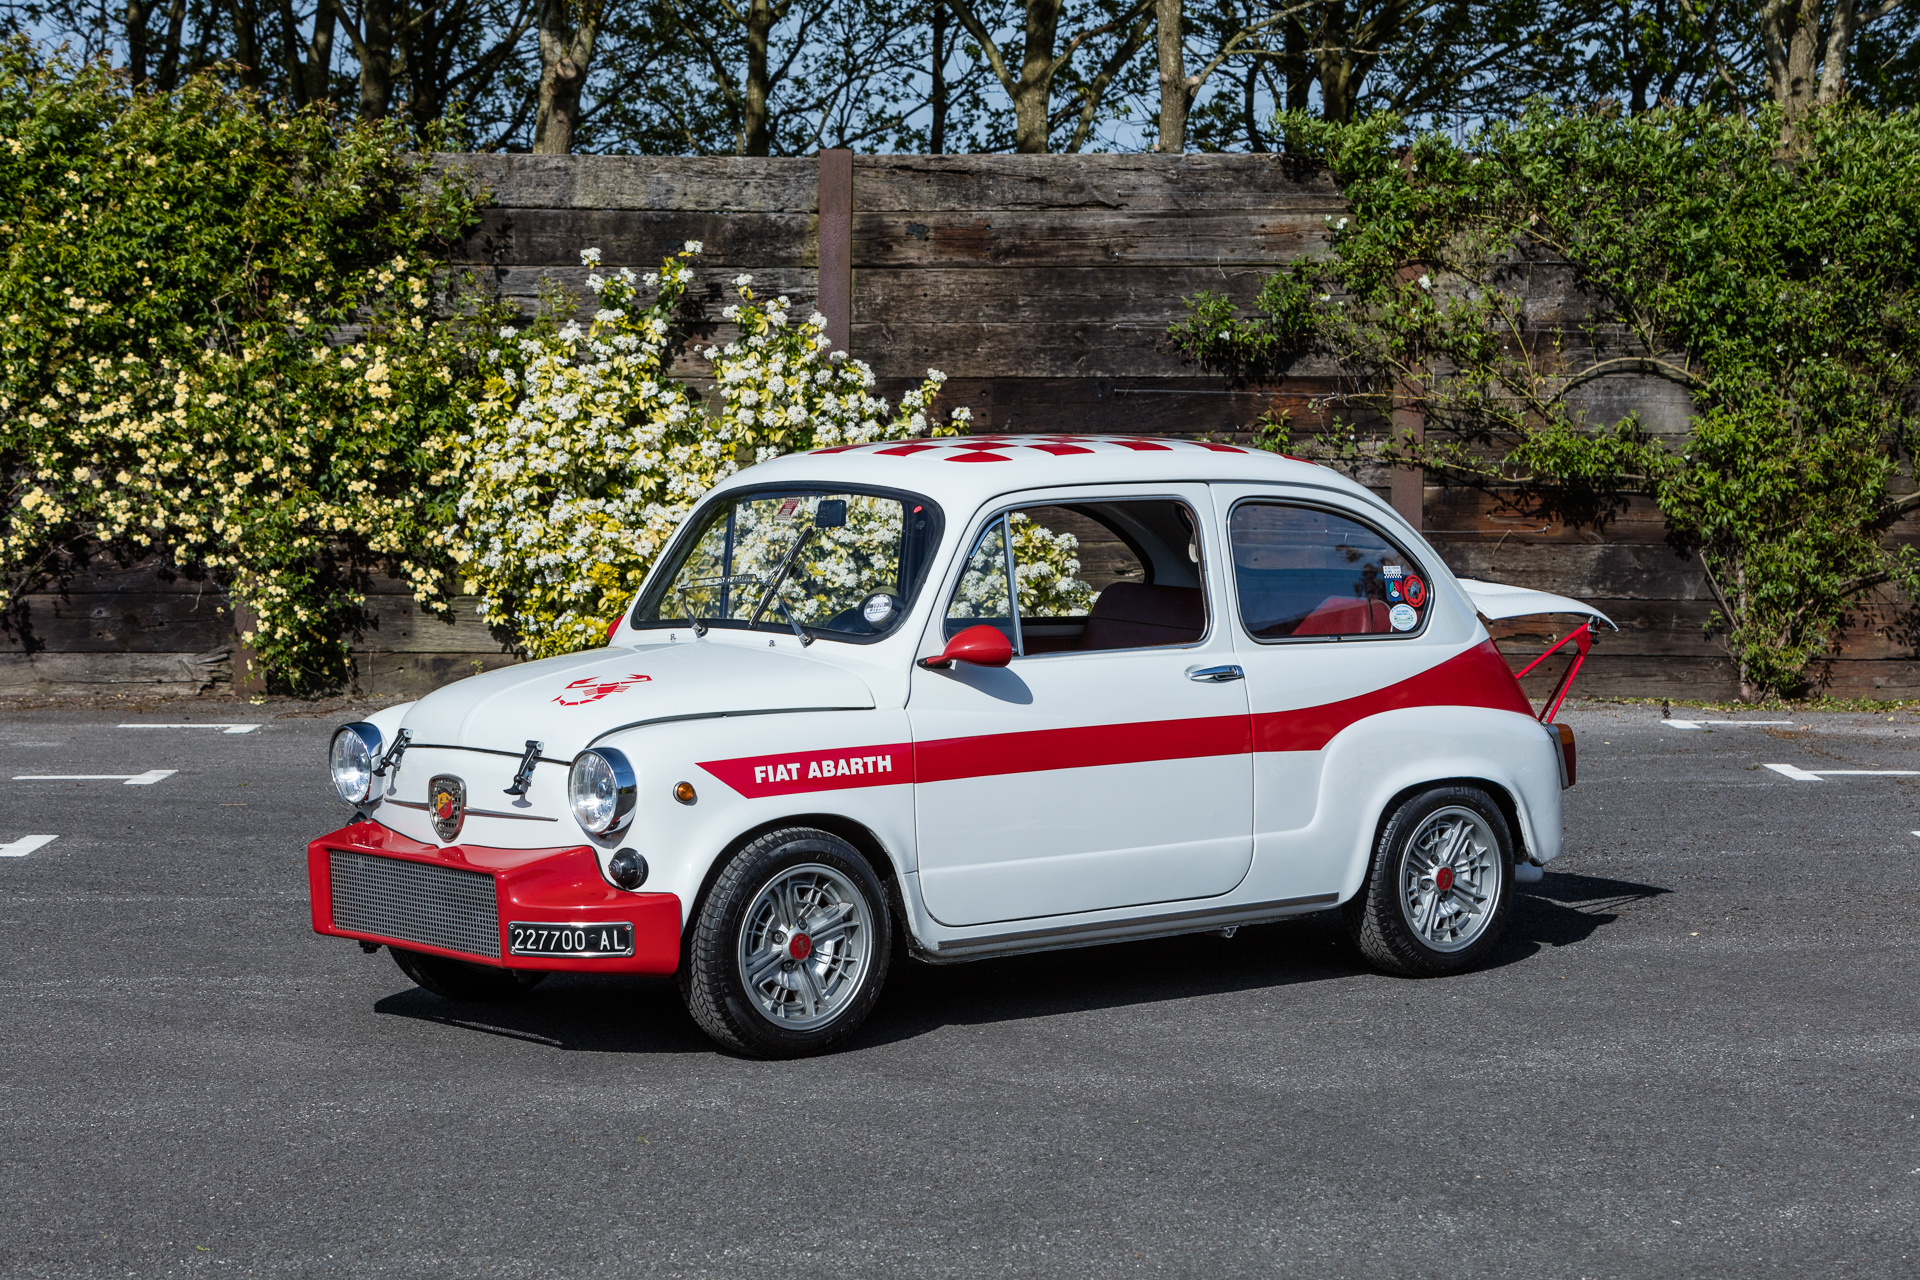 1967 FIAT ABARTH 850 TC TRIBUTE